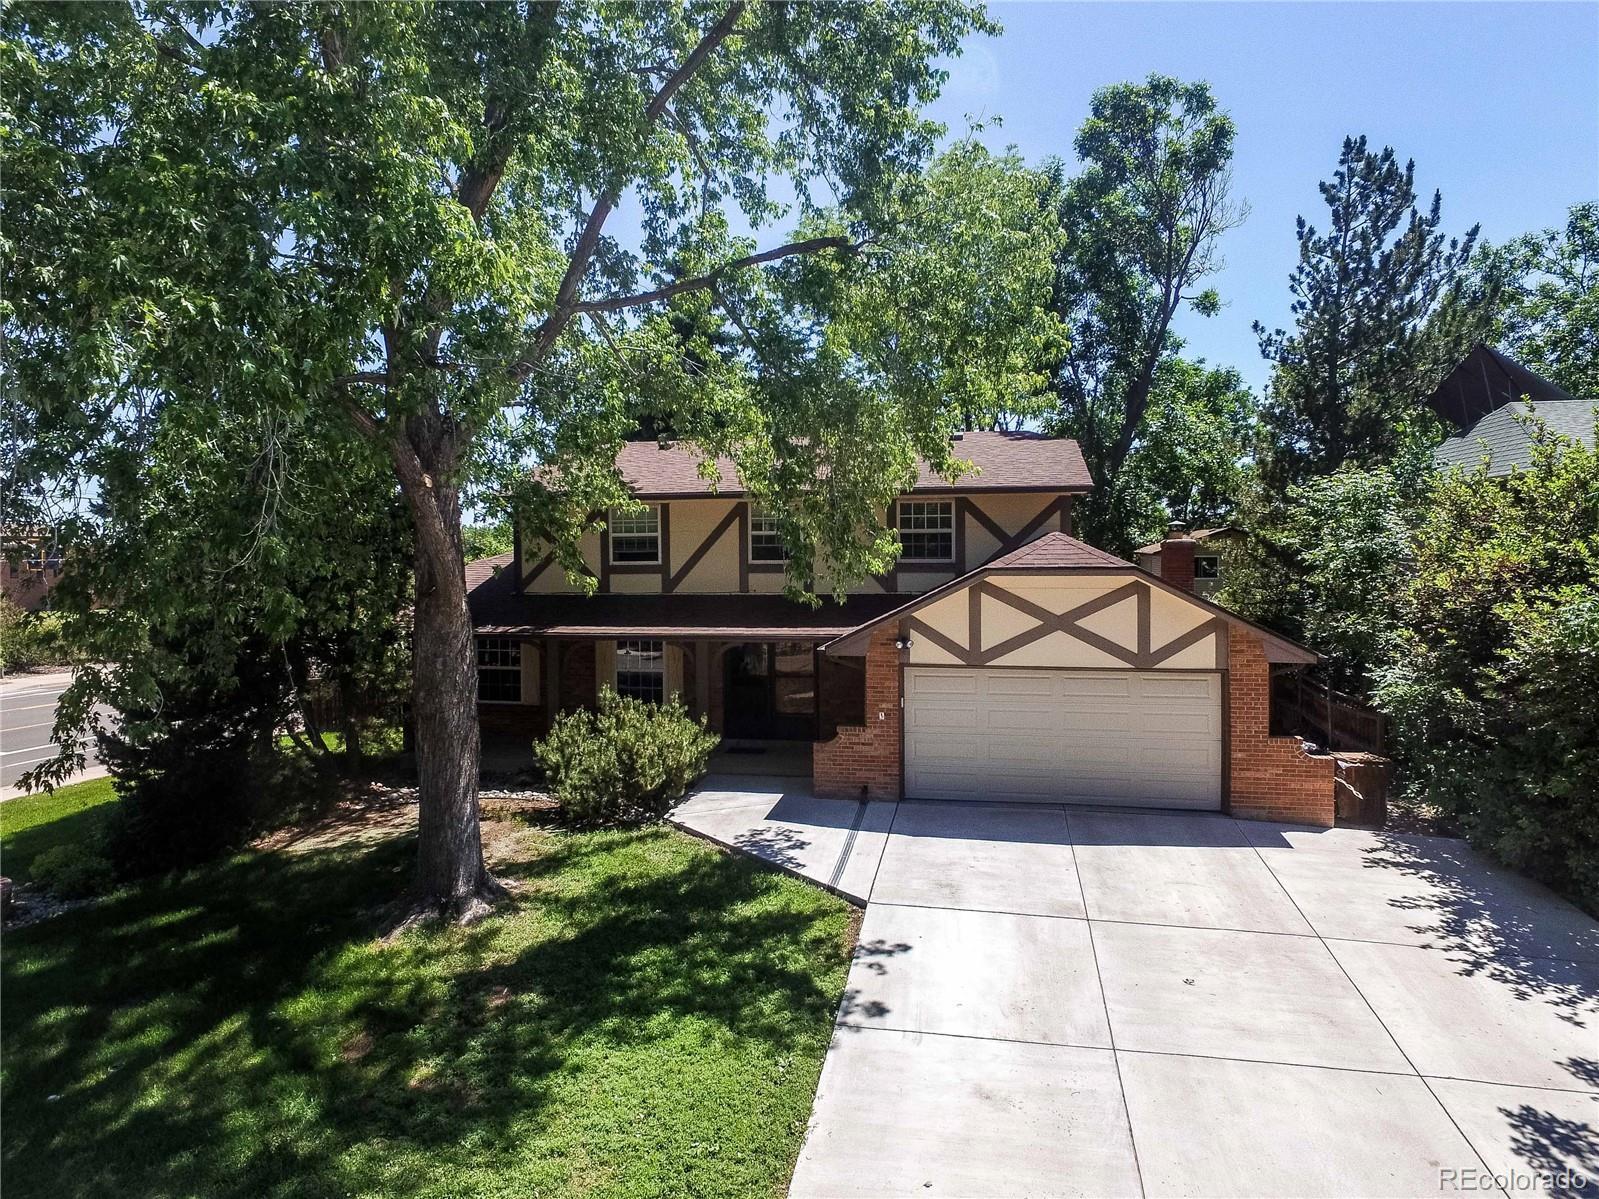 MLS# 3238375 - 3 - 1506 S Hoyt Street, Lakewood, CO 80232